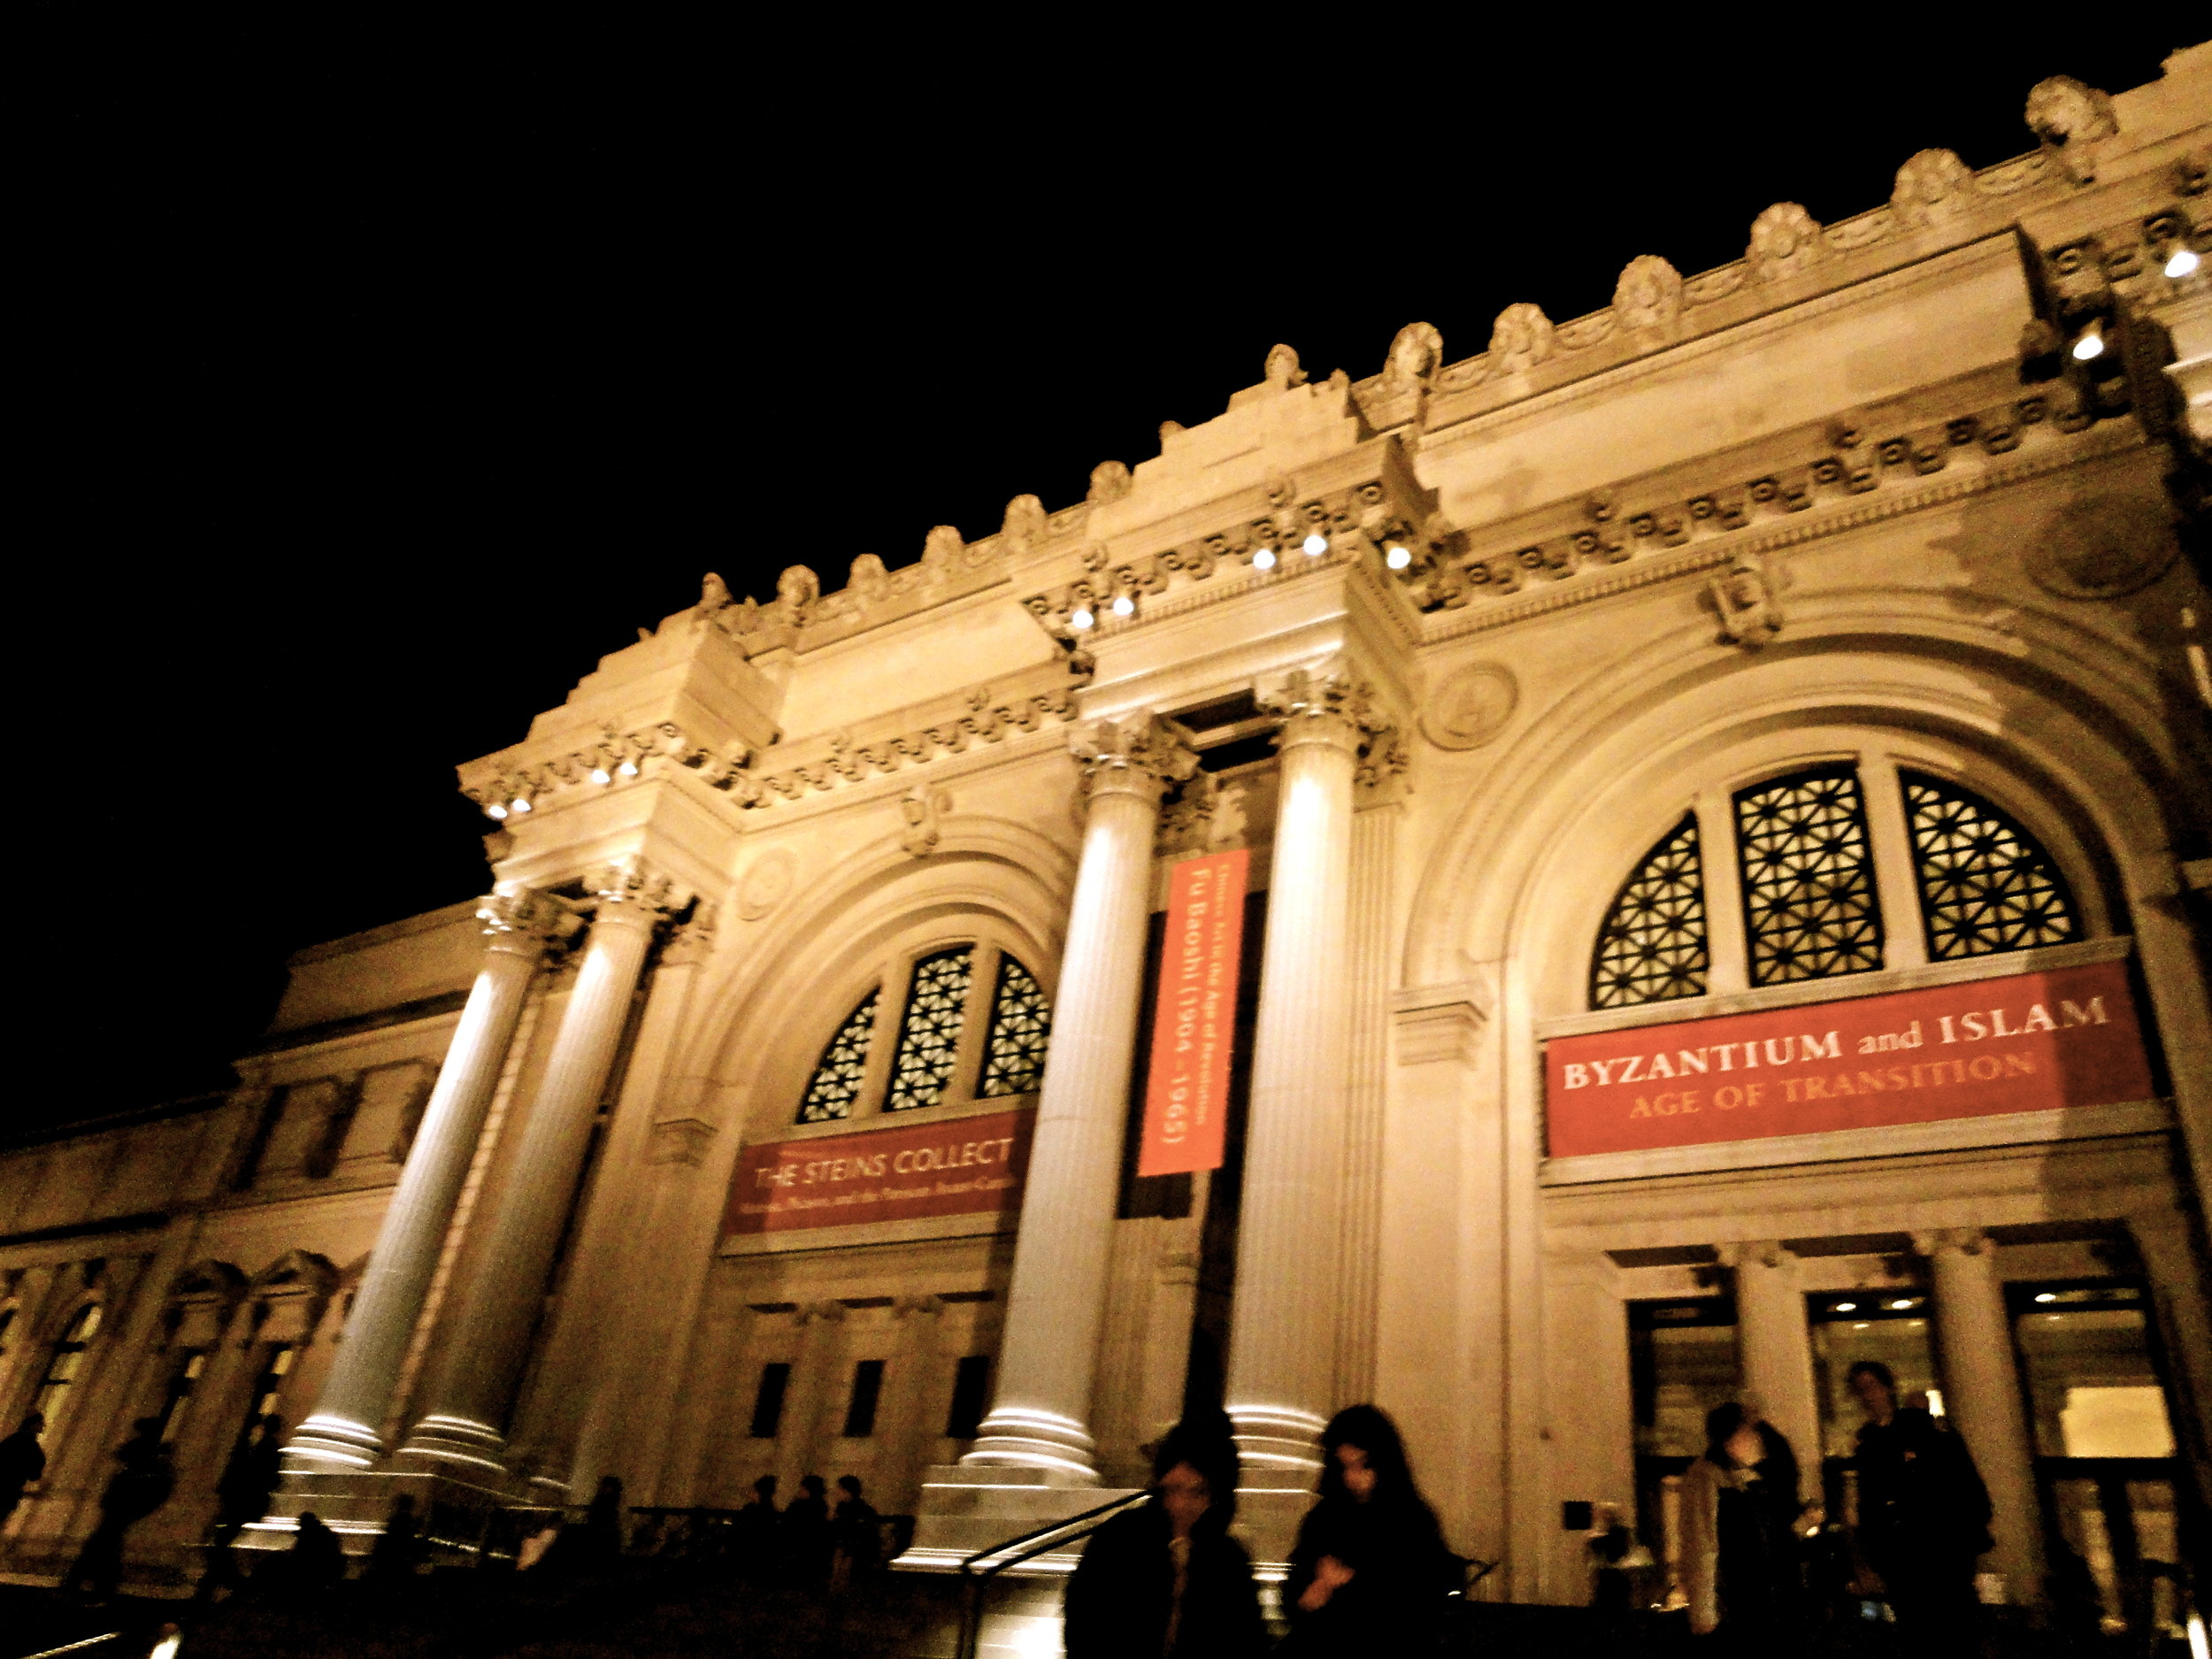 Metropolitan Museum of Art. Photo by Kara Bettis.